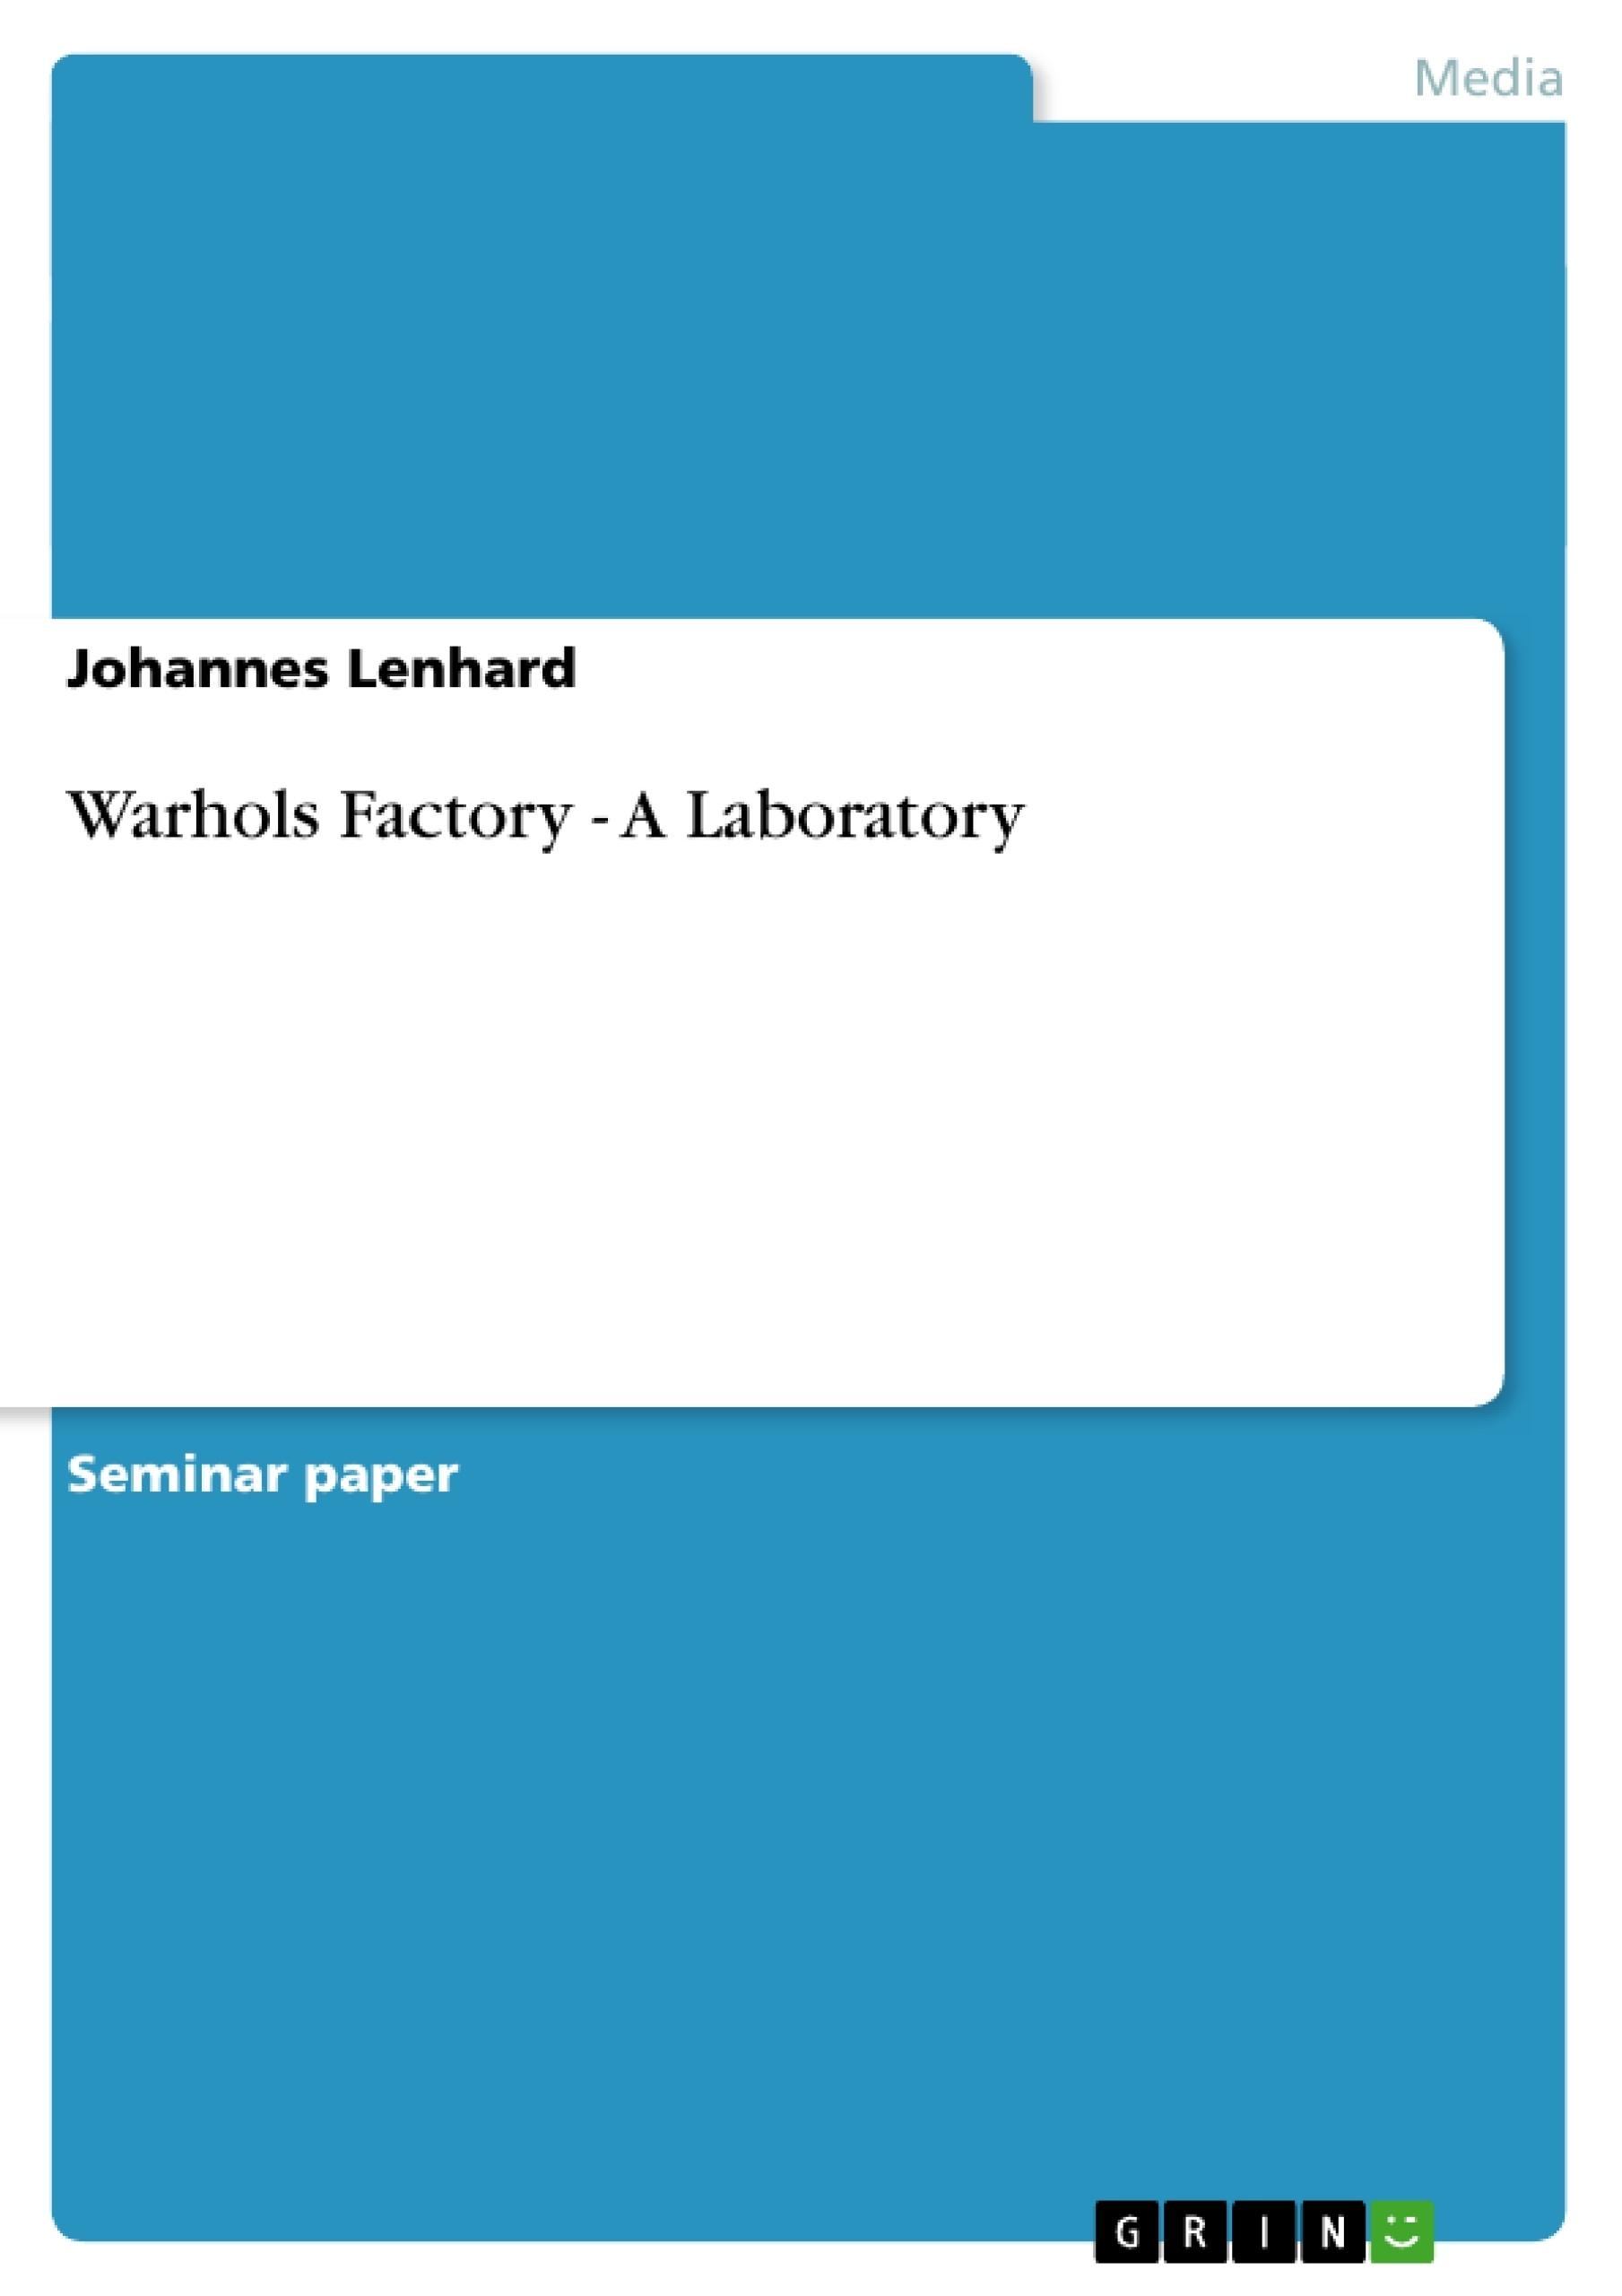 Title: Warhols Factory - A Laboratory